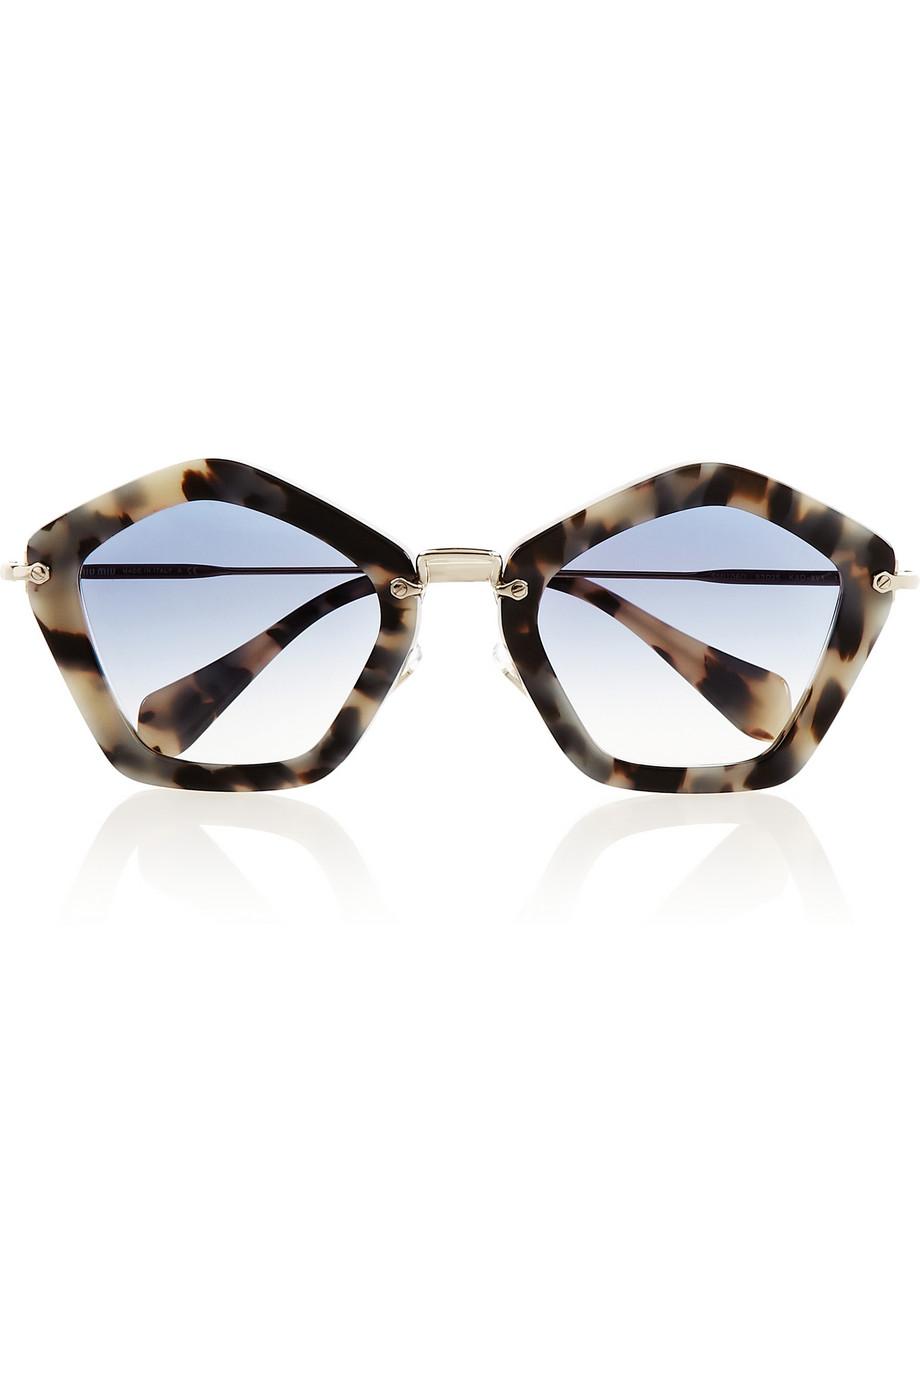 4393ffdacc7a MIU MIU tortoiseshell glasses 292 EUR